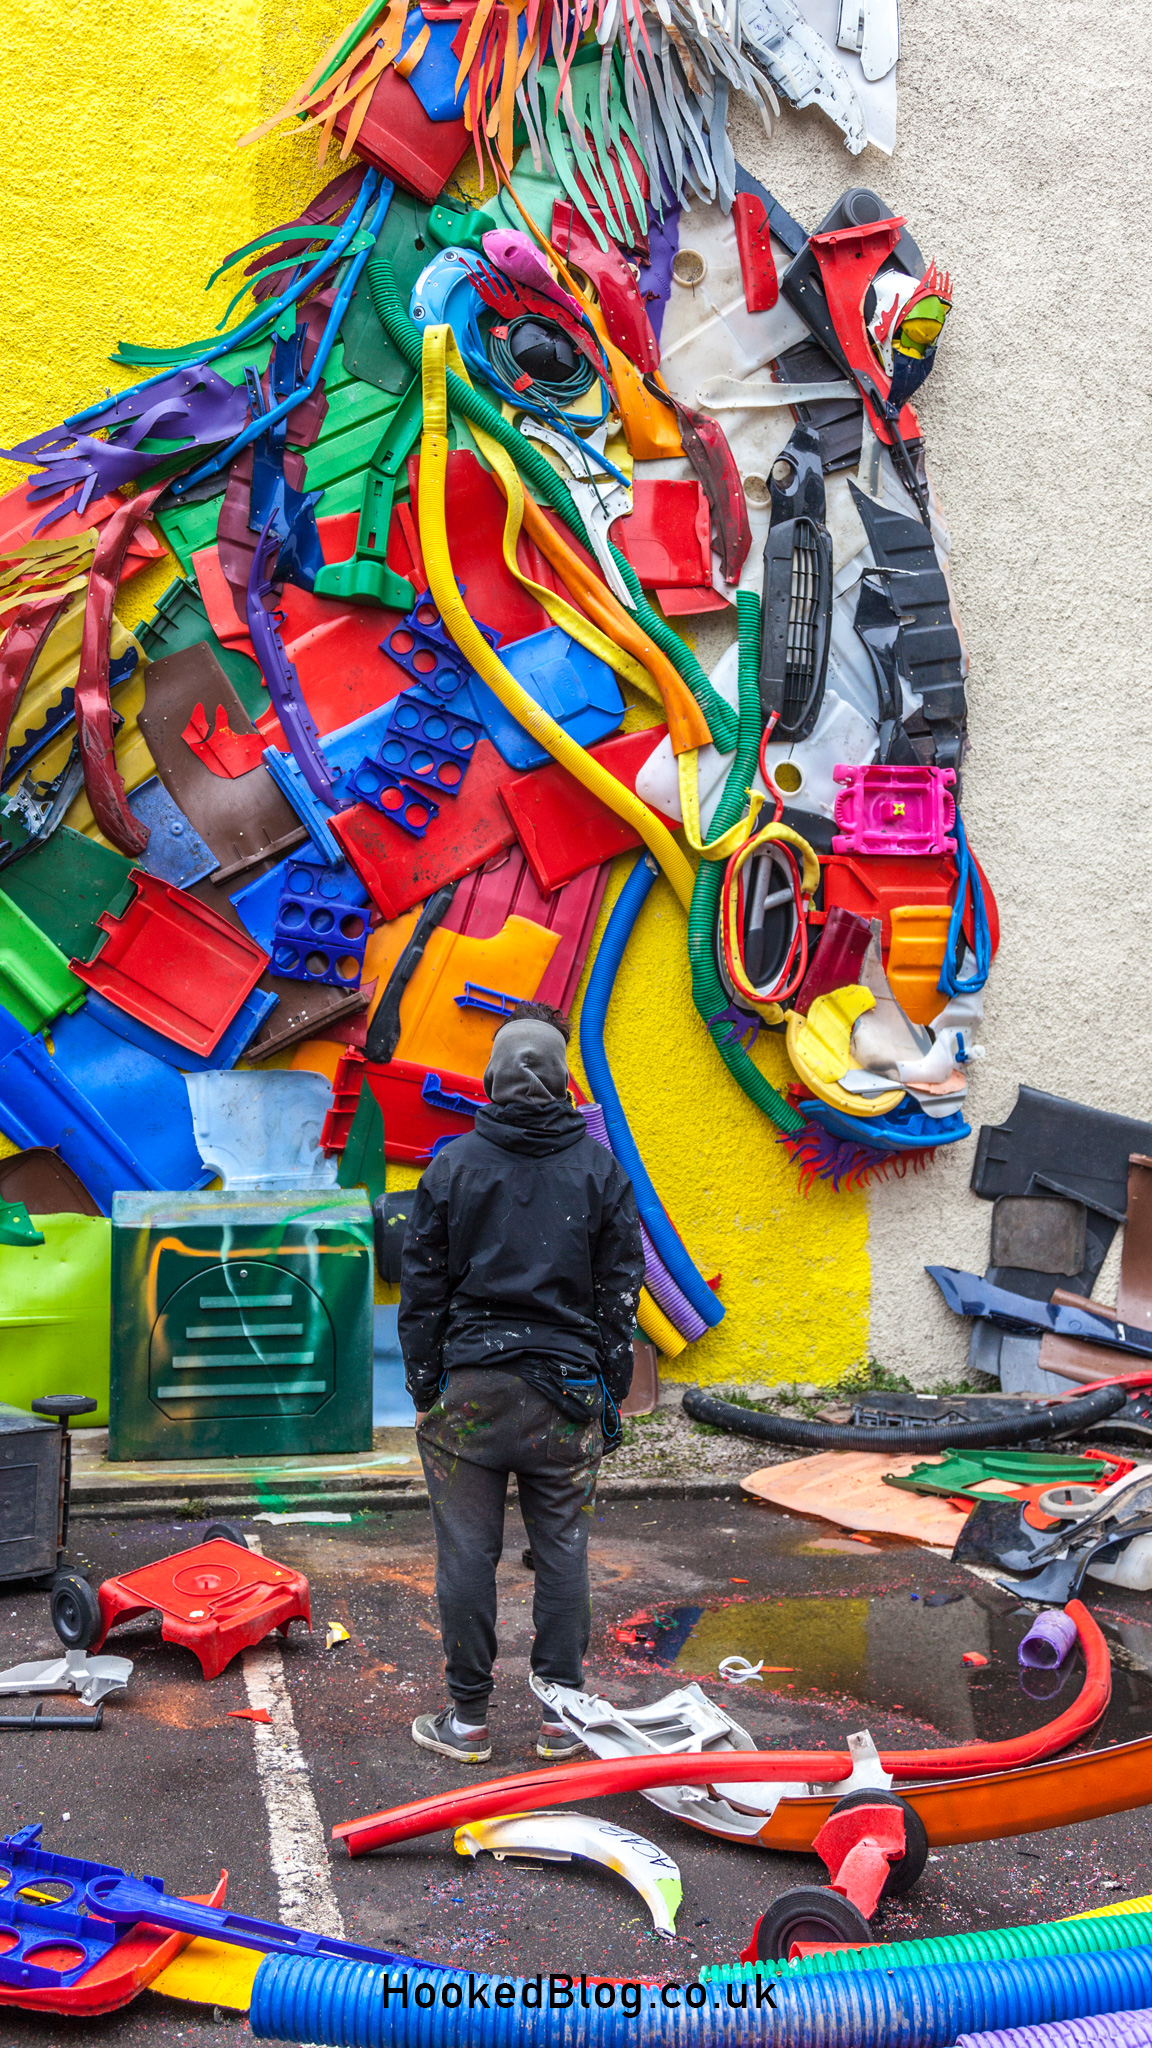 Portuguese Graffiti Artist Bordalo II's Endangered Dreams Unicorn sculpture In Aberdeen, Scotland. #streetart #Scotland #Hookedblog